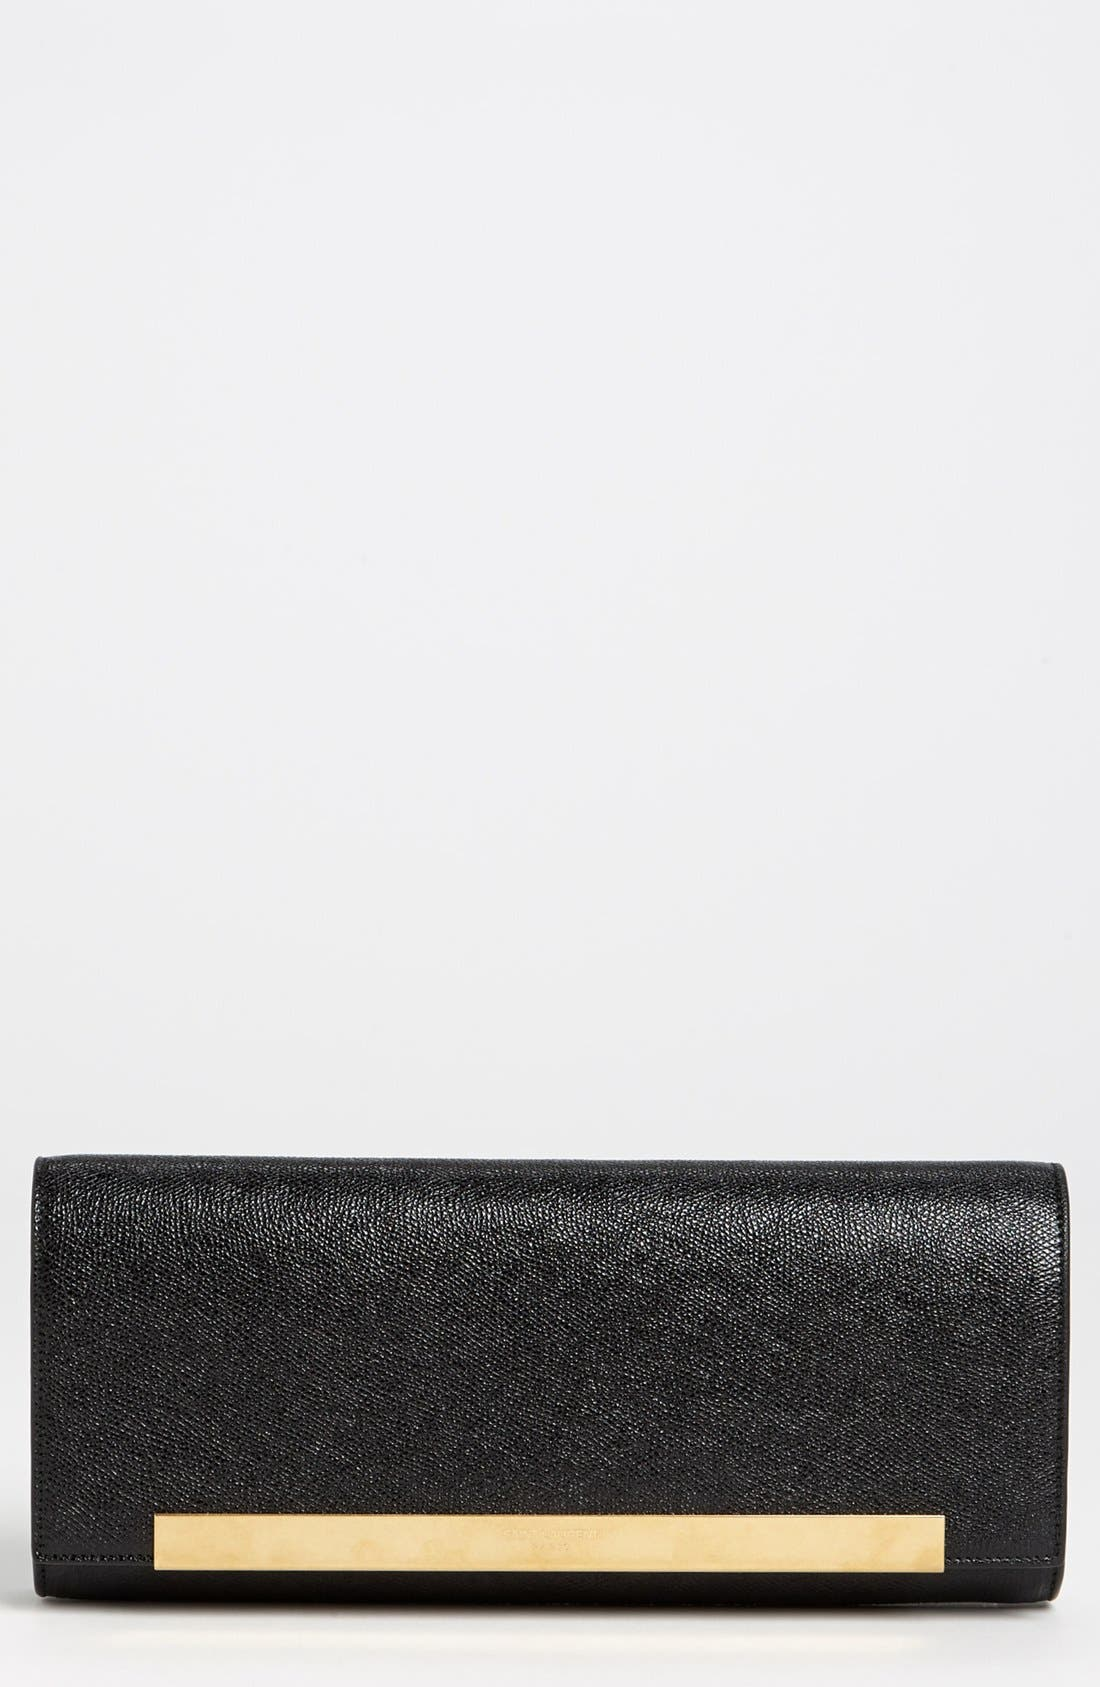 Main Image - Saint Laurent 'Lutetia - Palmellato' Leather Clutch